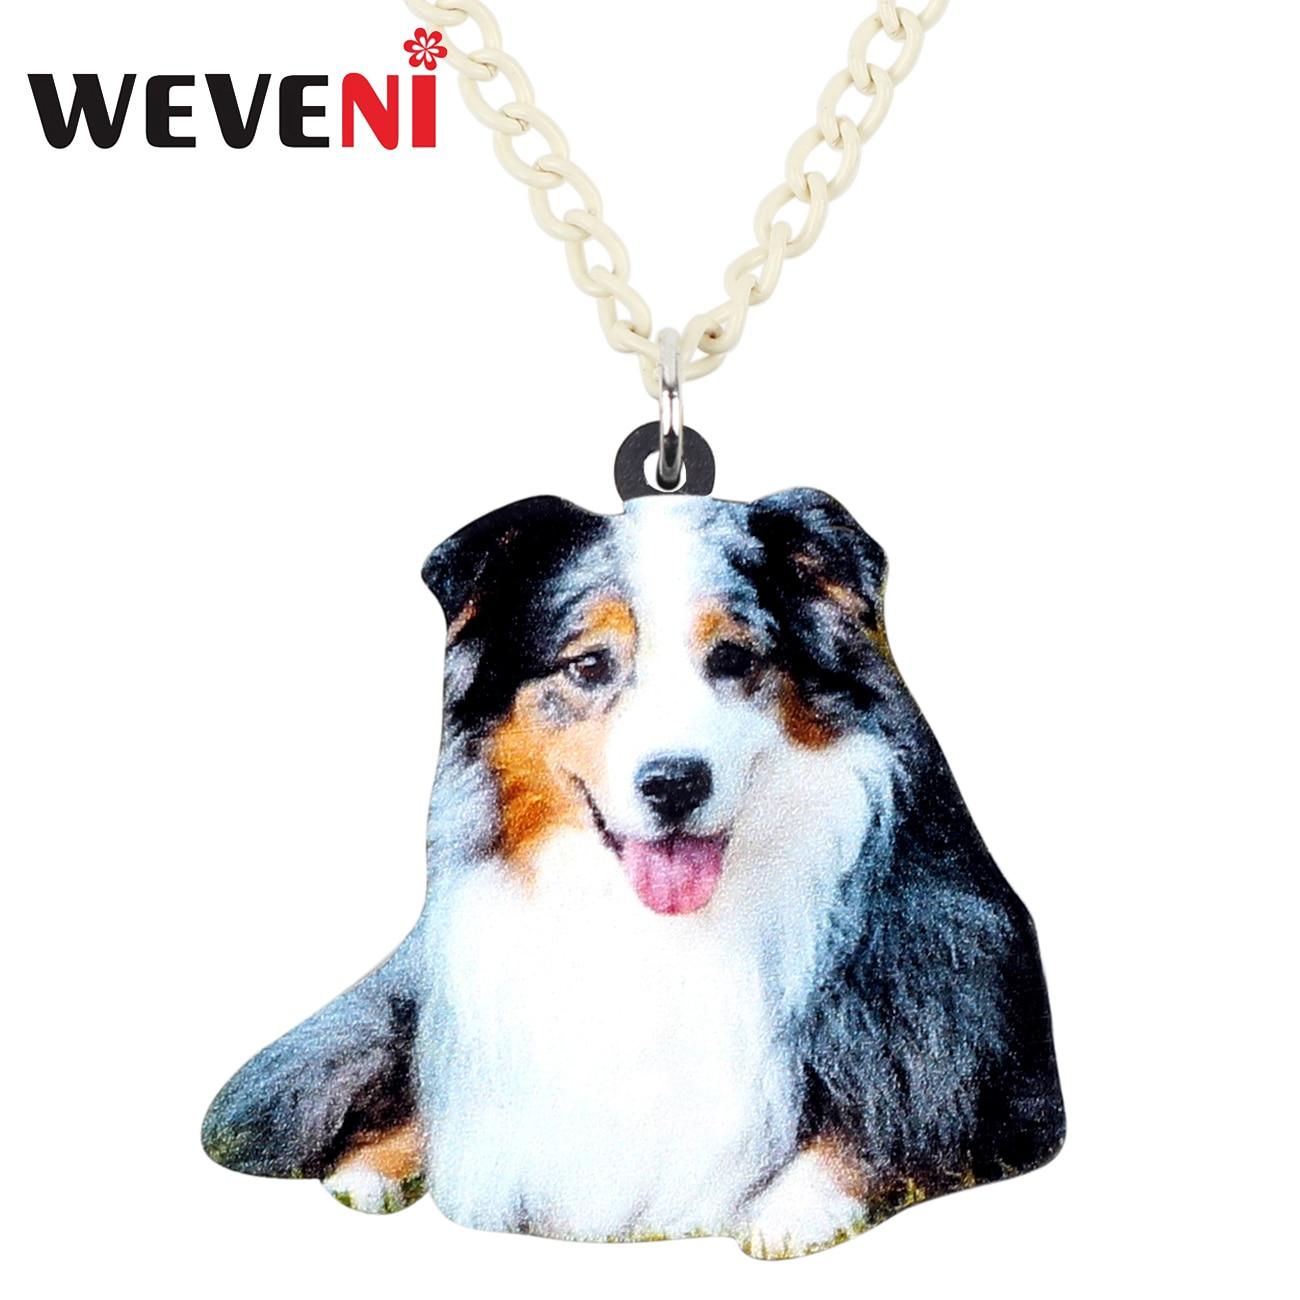 WEVENI Acrylic Smile Australian Shepherd Dog Necklace Pendant Collare Fashion Animal Pets Jewelry For Women Girls Friends Gift